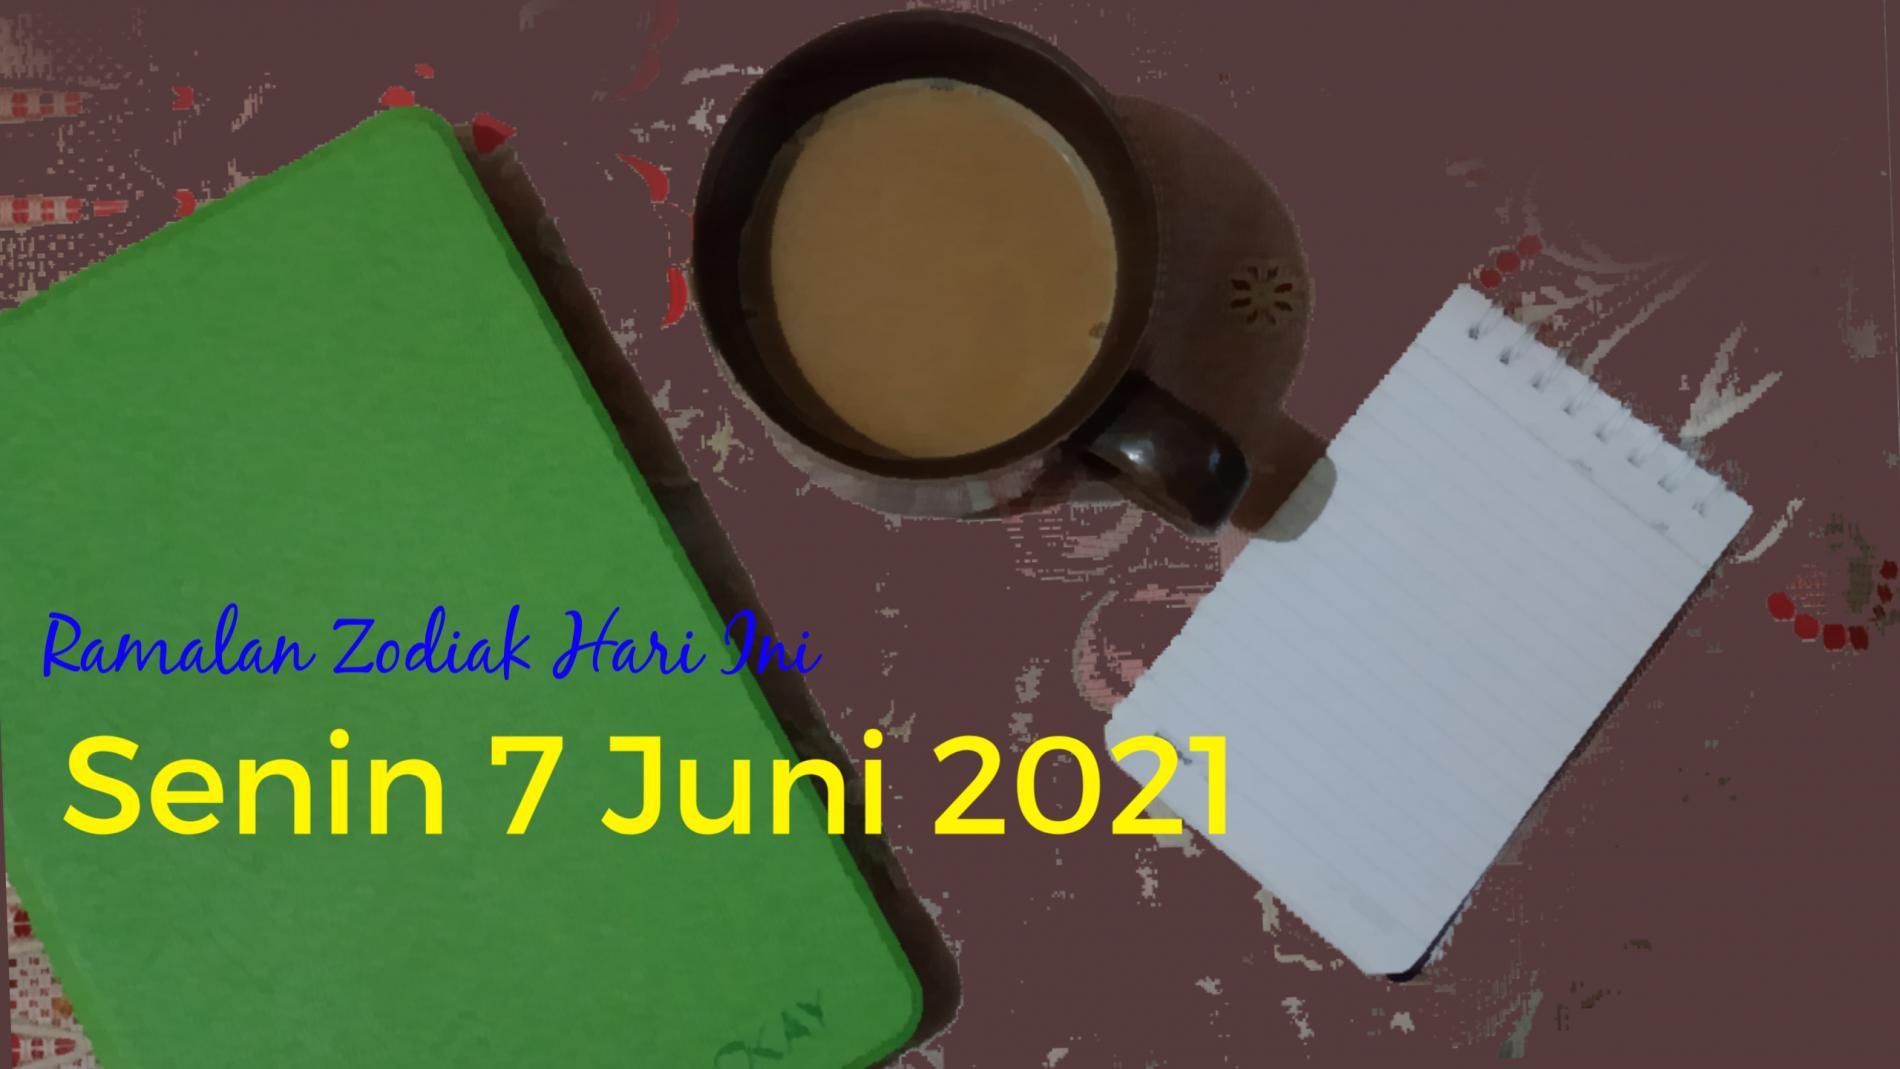 Ramalan Zodiak Hari ini Senin 7 Juni 2021, Aries dan Sagitarius Mulai dari Nol, Leo Bermain Api